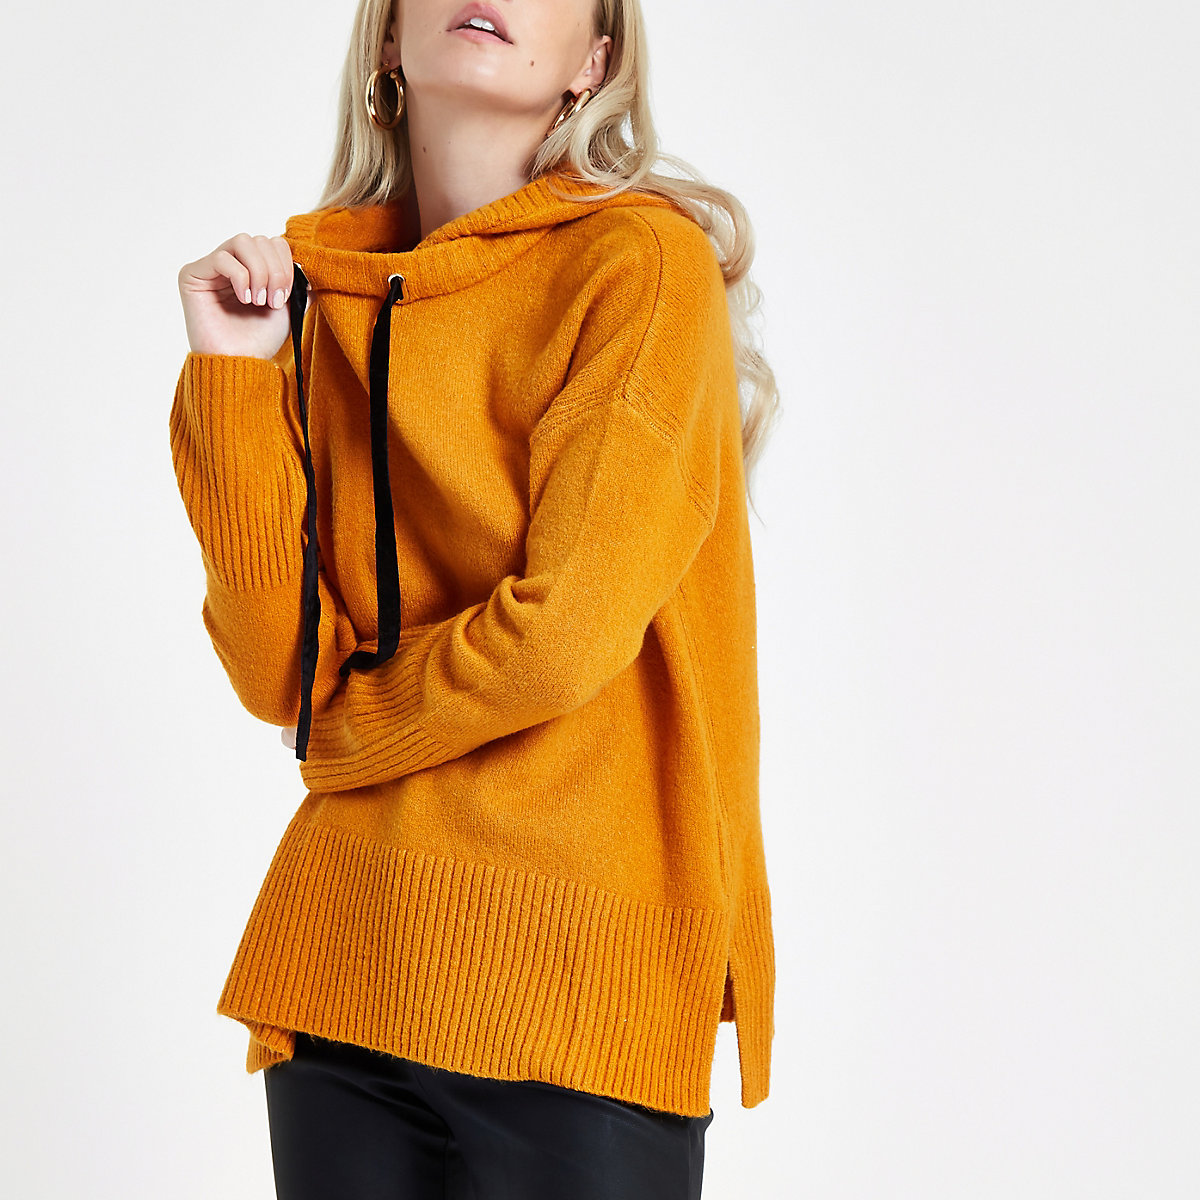 Petite orange knitted hooded jumper